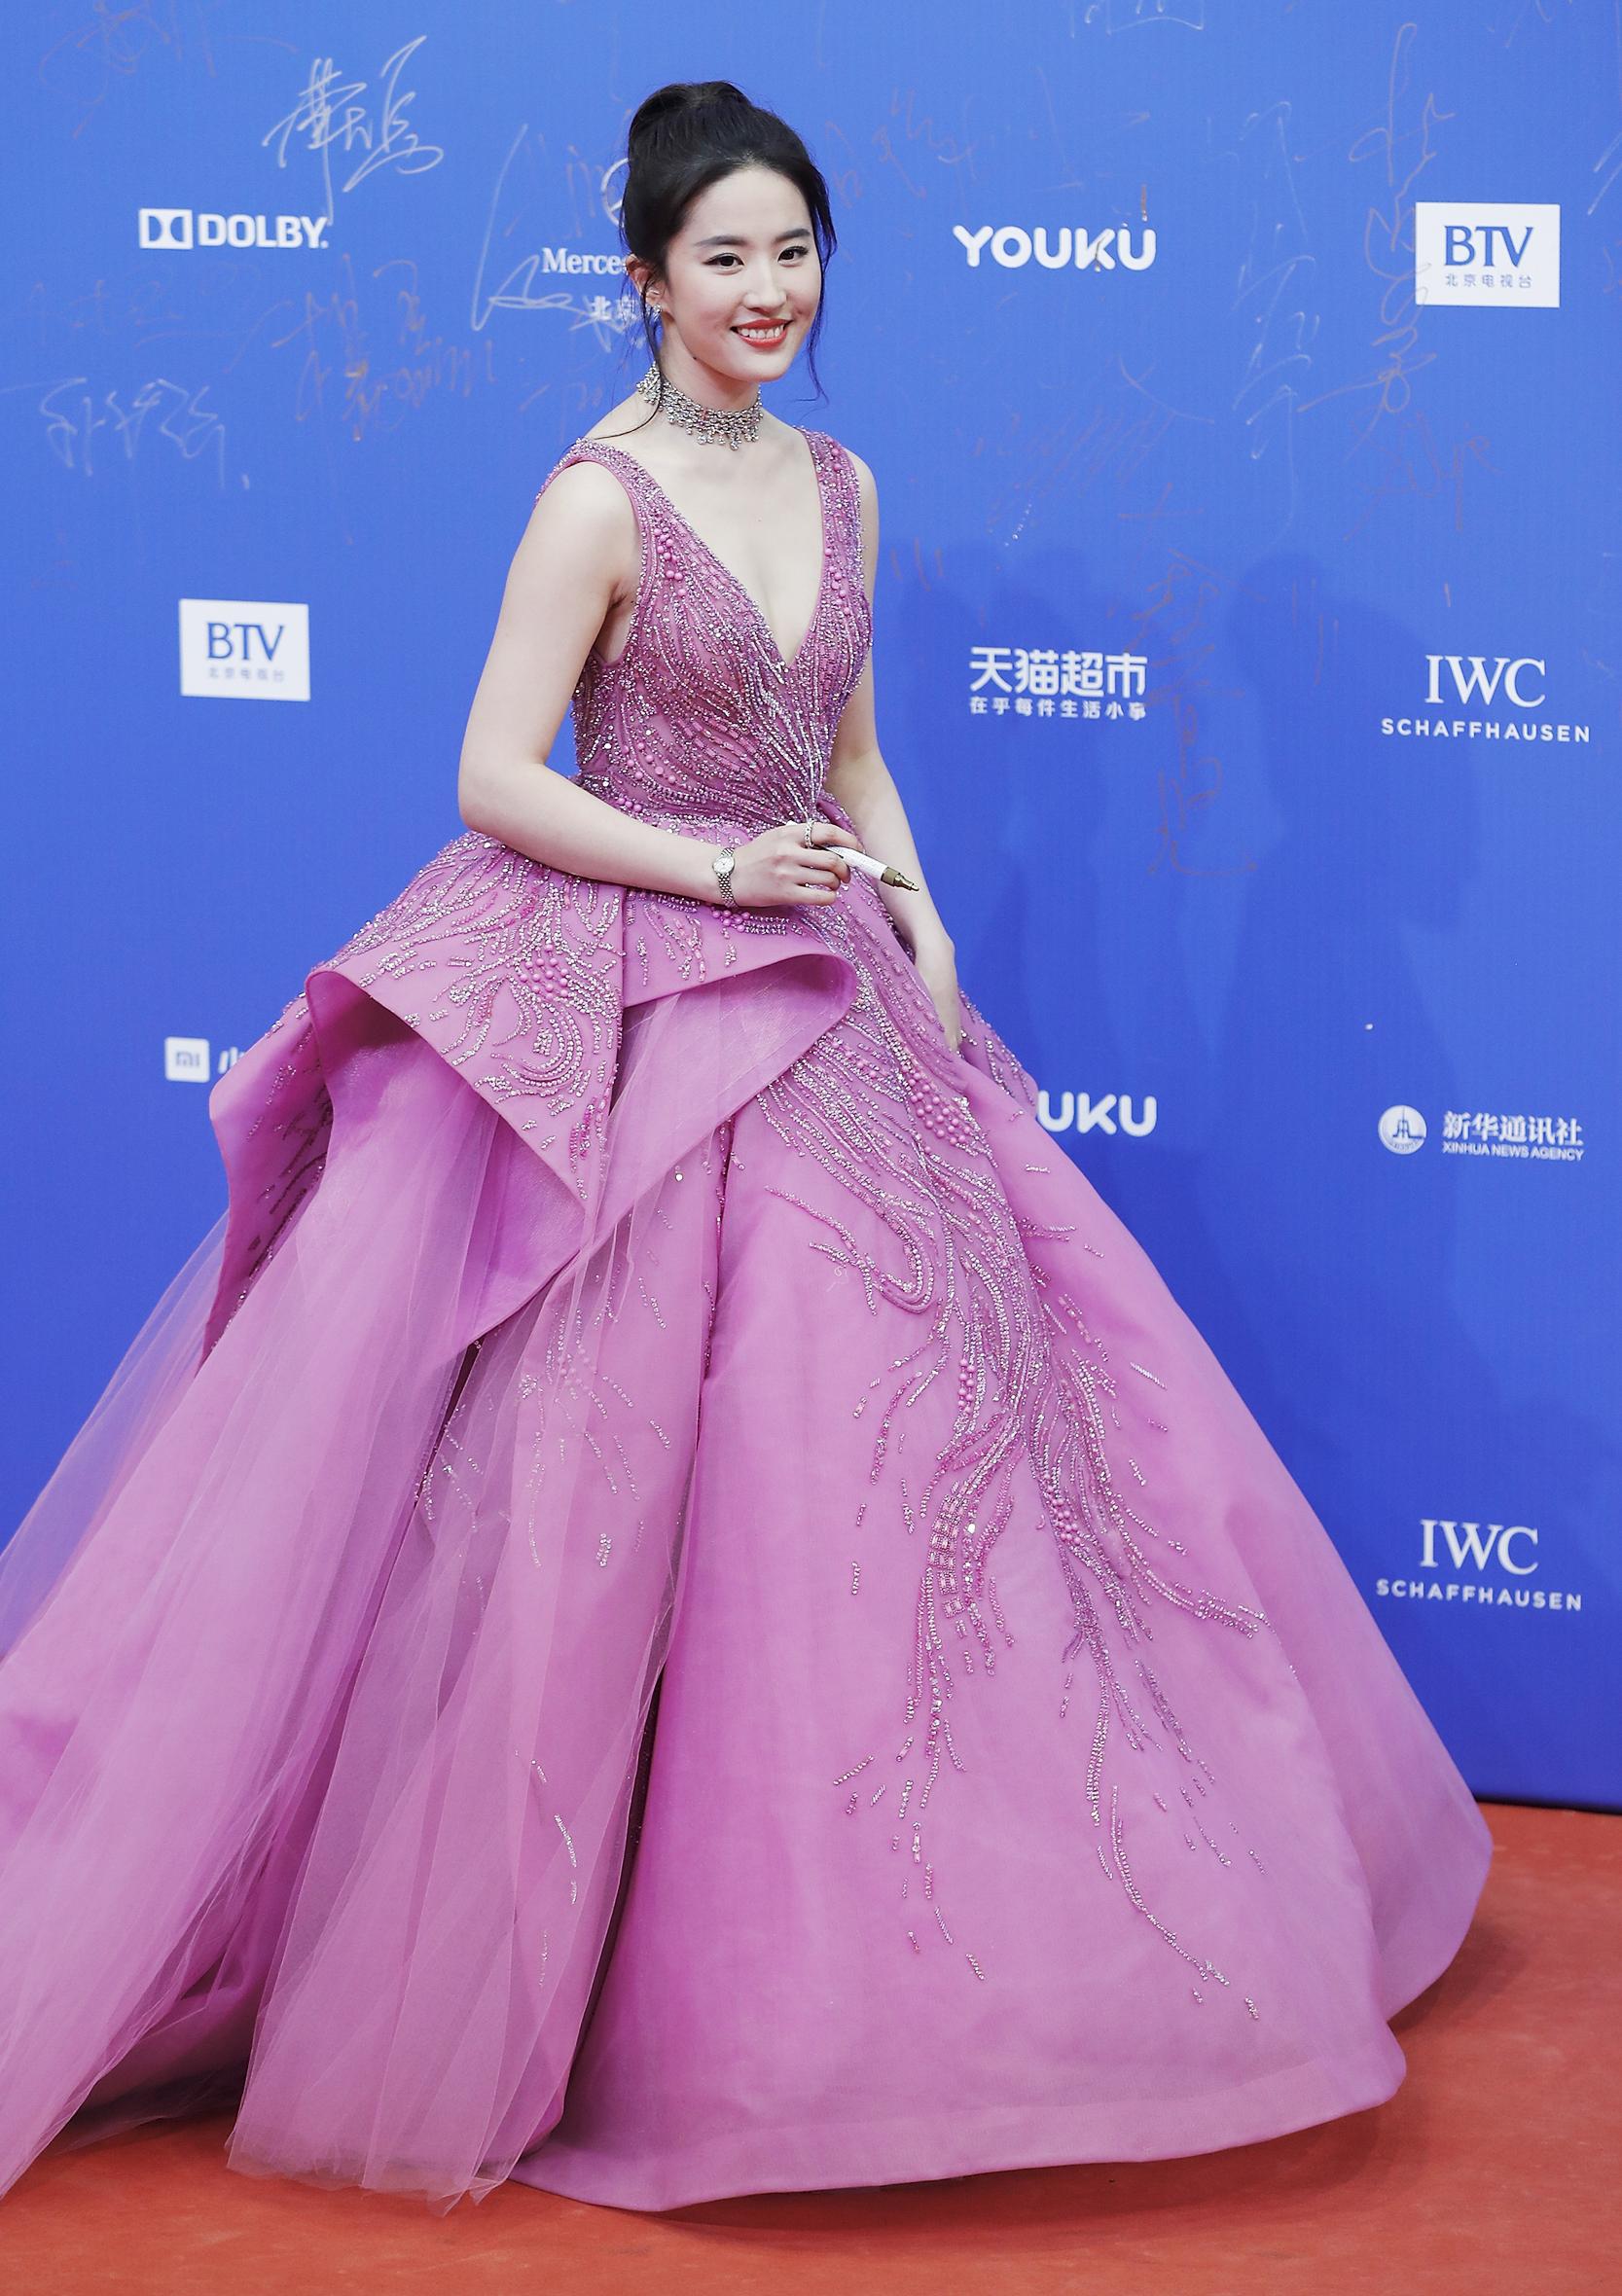 Image: Actress Liu Yifei arrives at the red carpet